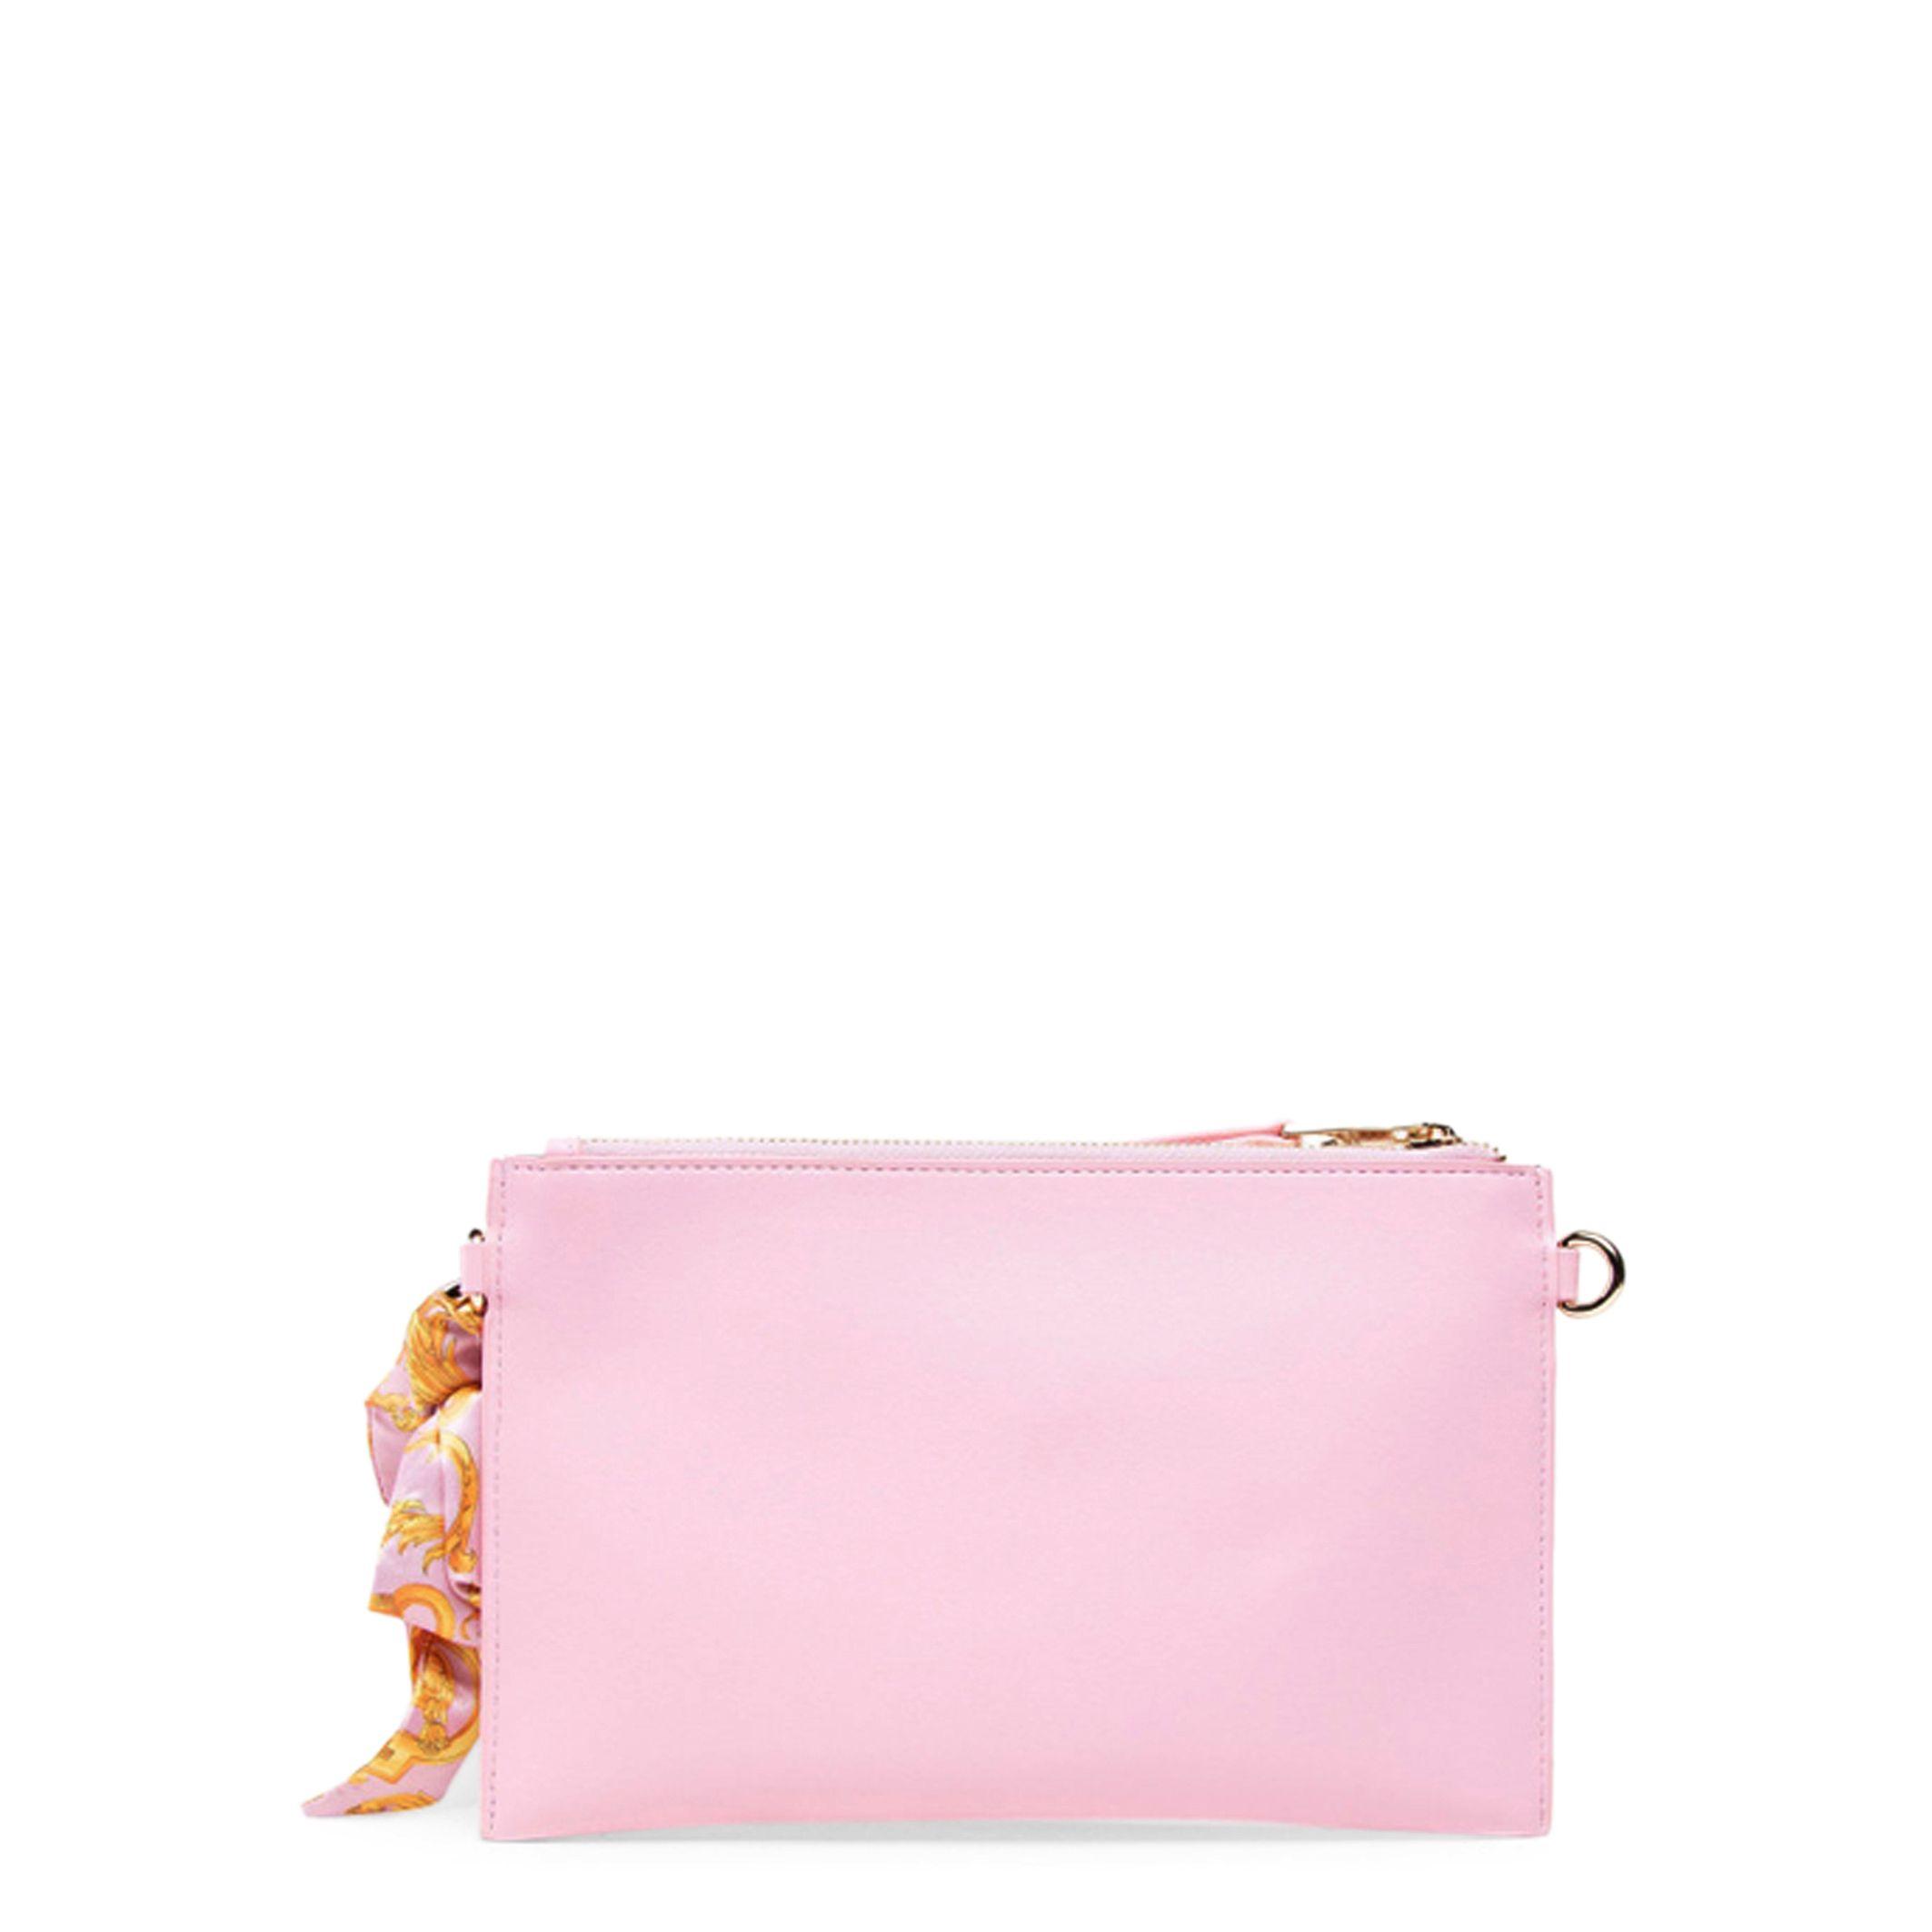 Versace Jeans – E1VWABAX_71875 – Rosa